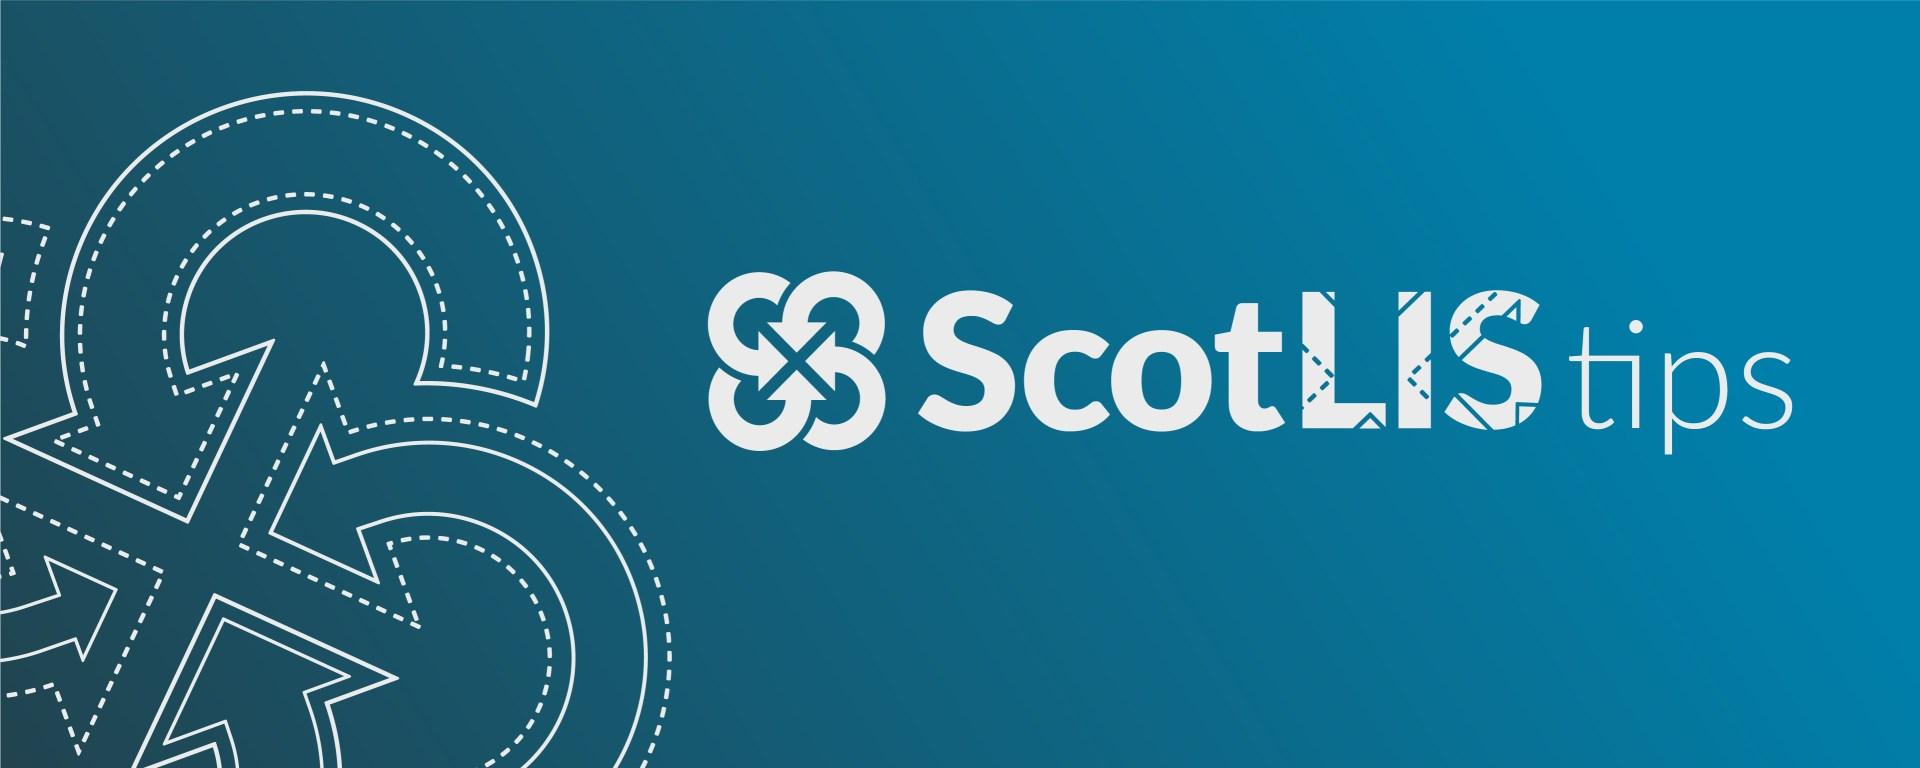 generic scotlis graphic banner